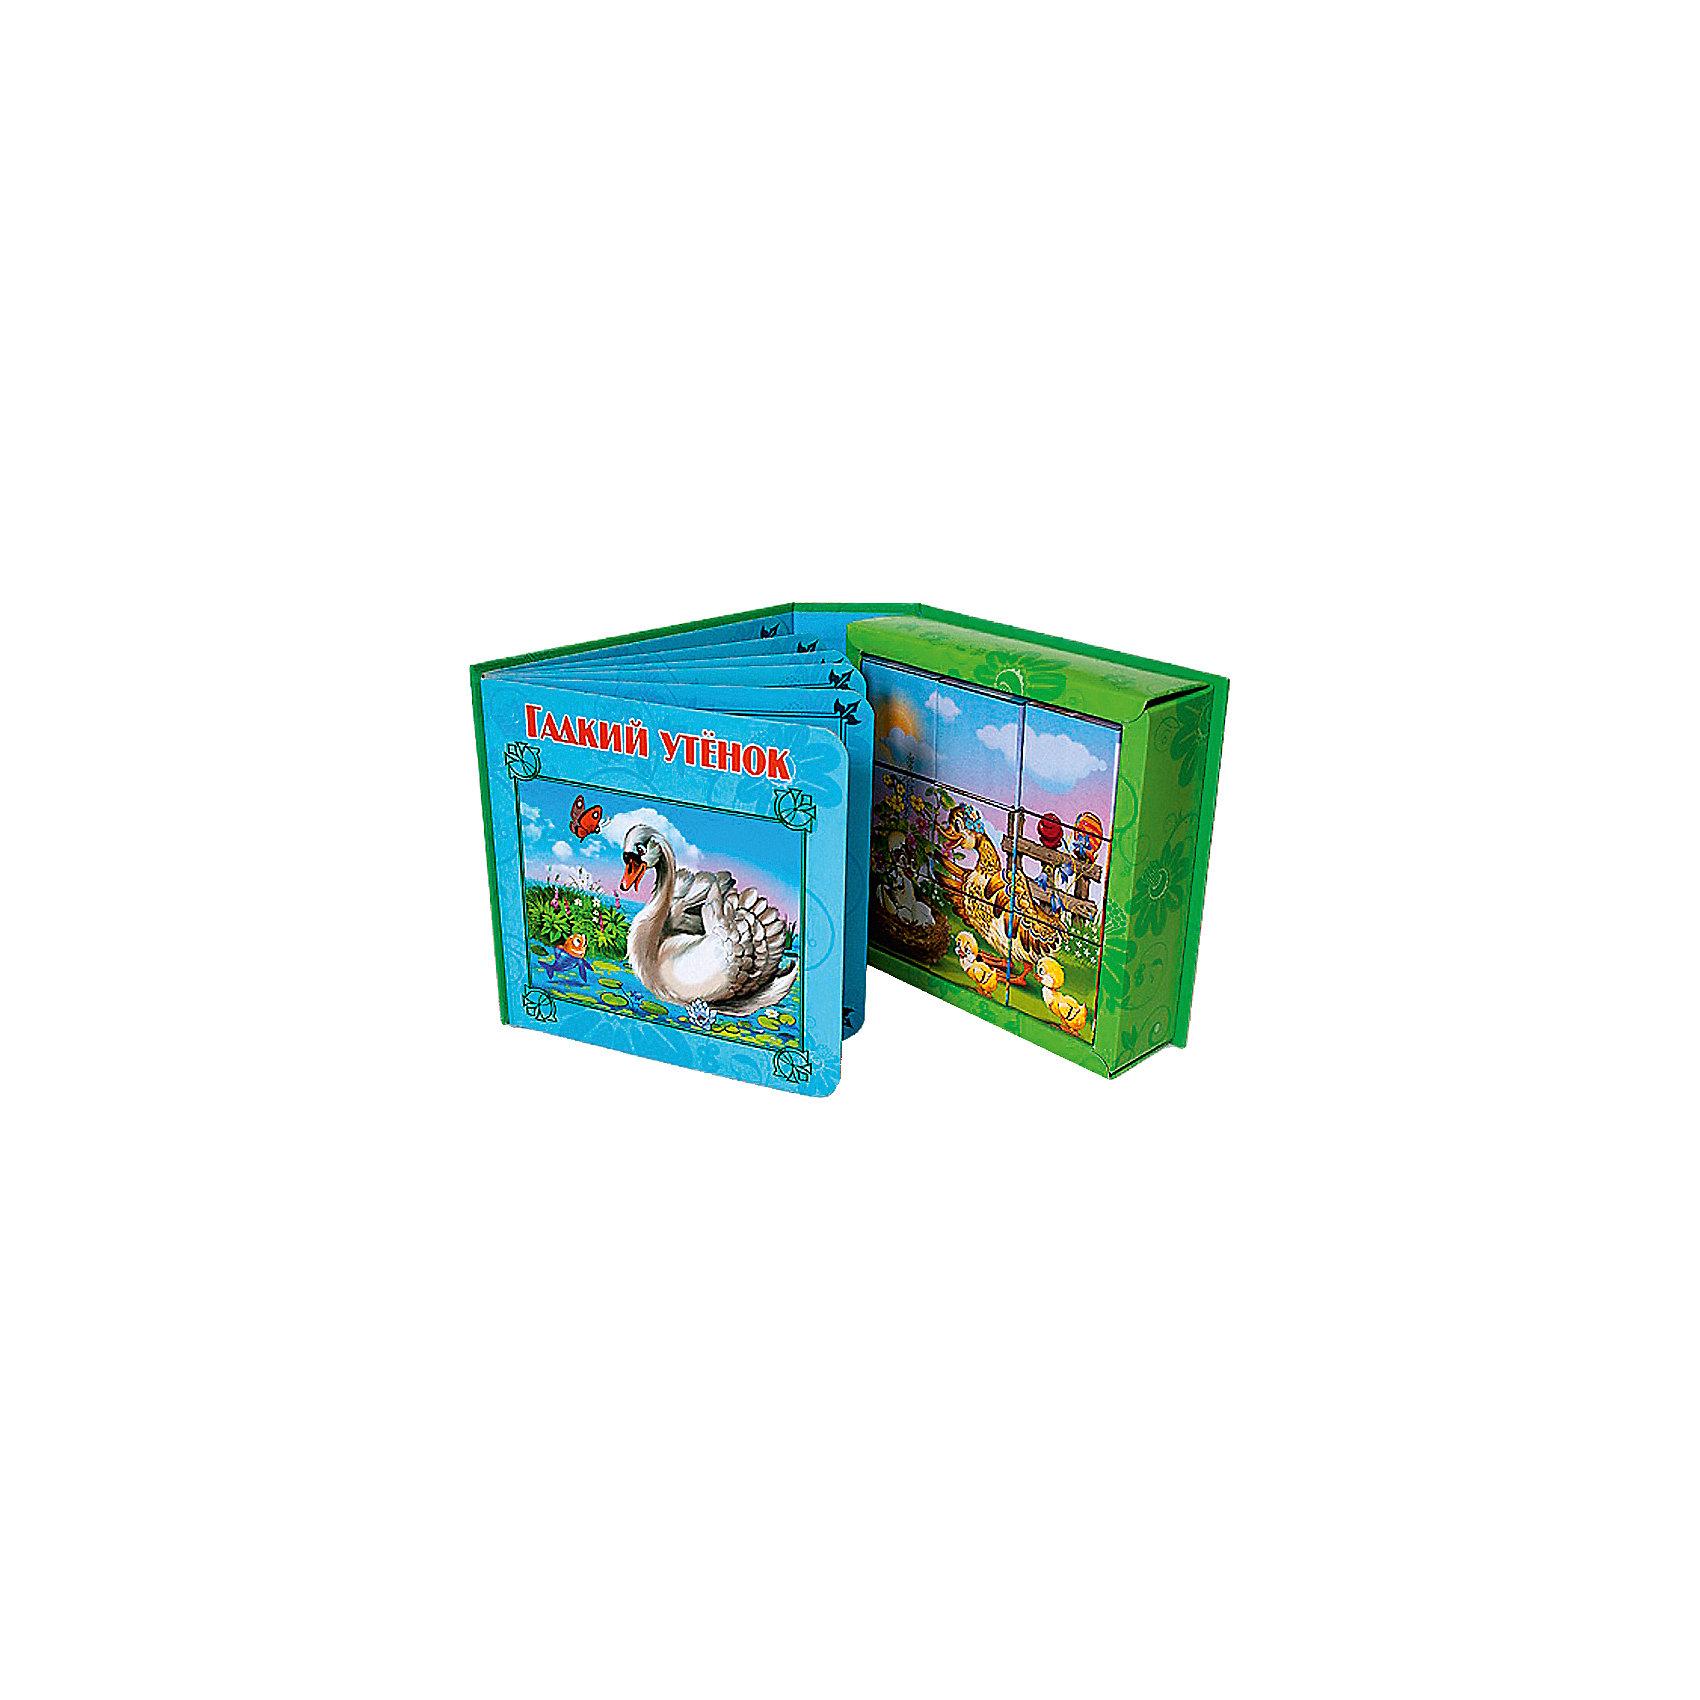 Проф-Пресс Книжка-игрушка Гадкий утёнок проф пресс книжка игрушка гадкий утёнок